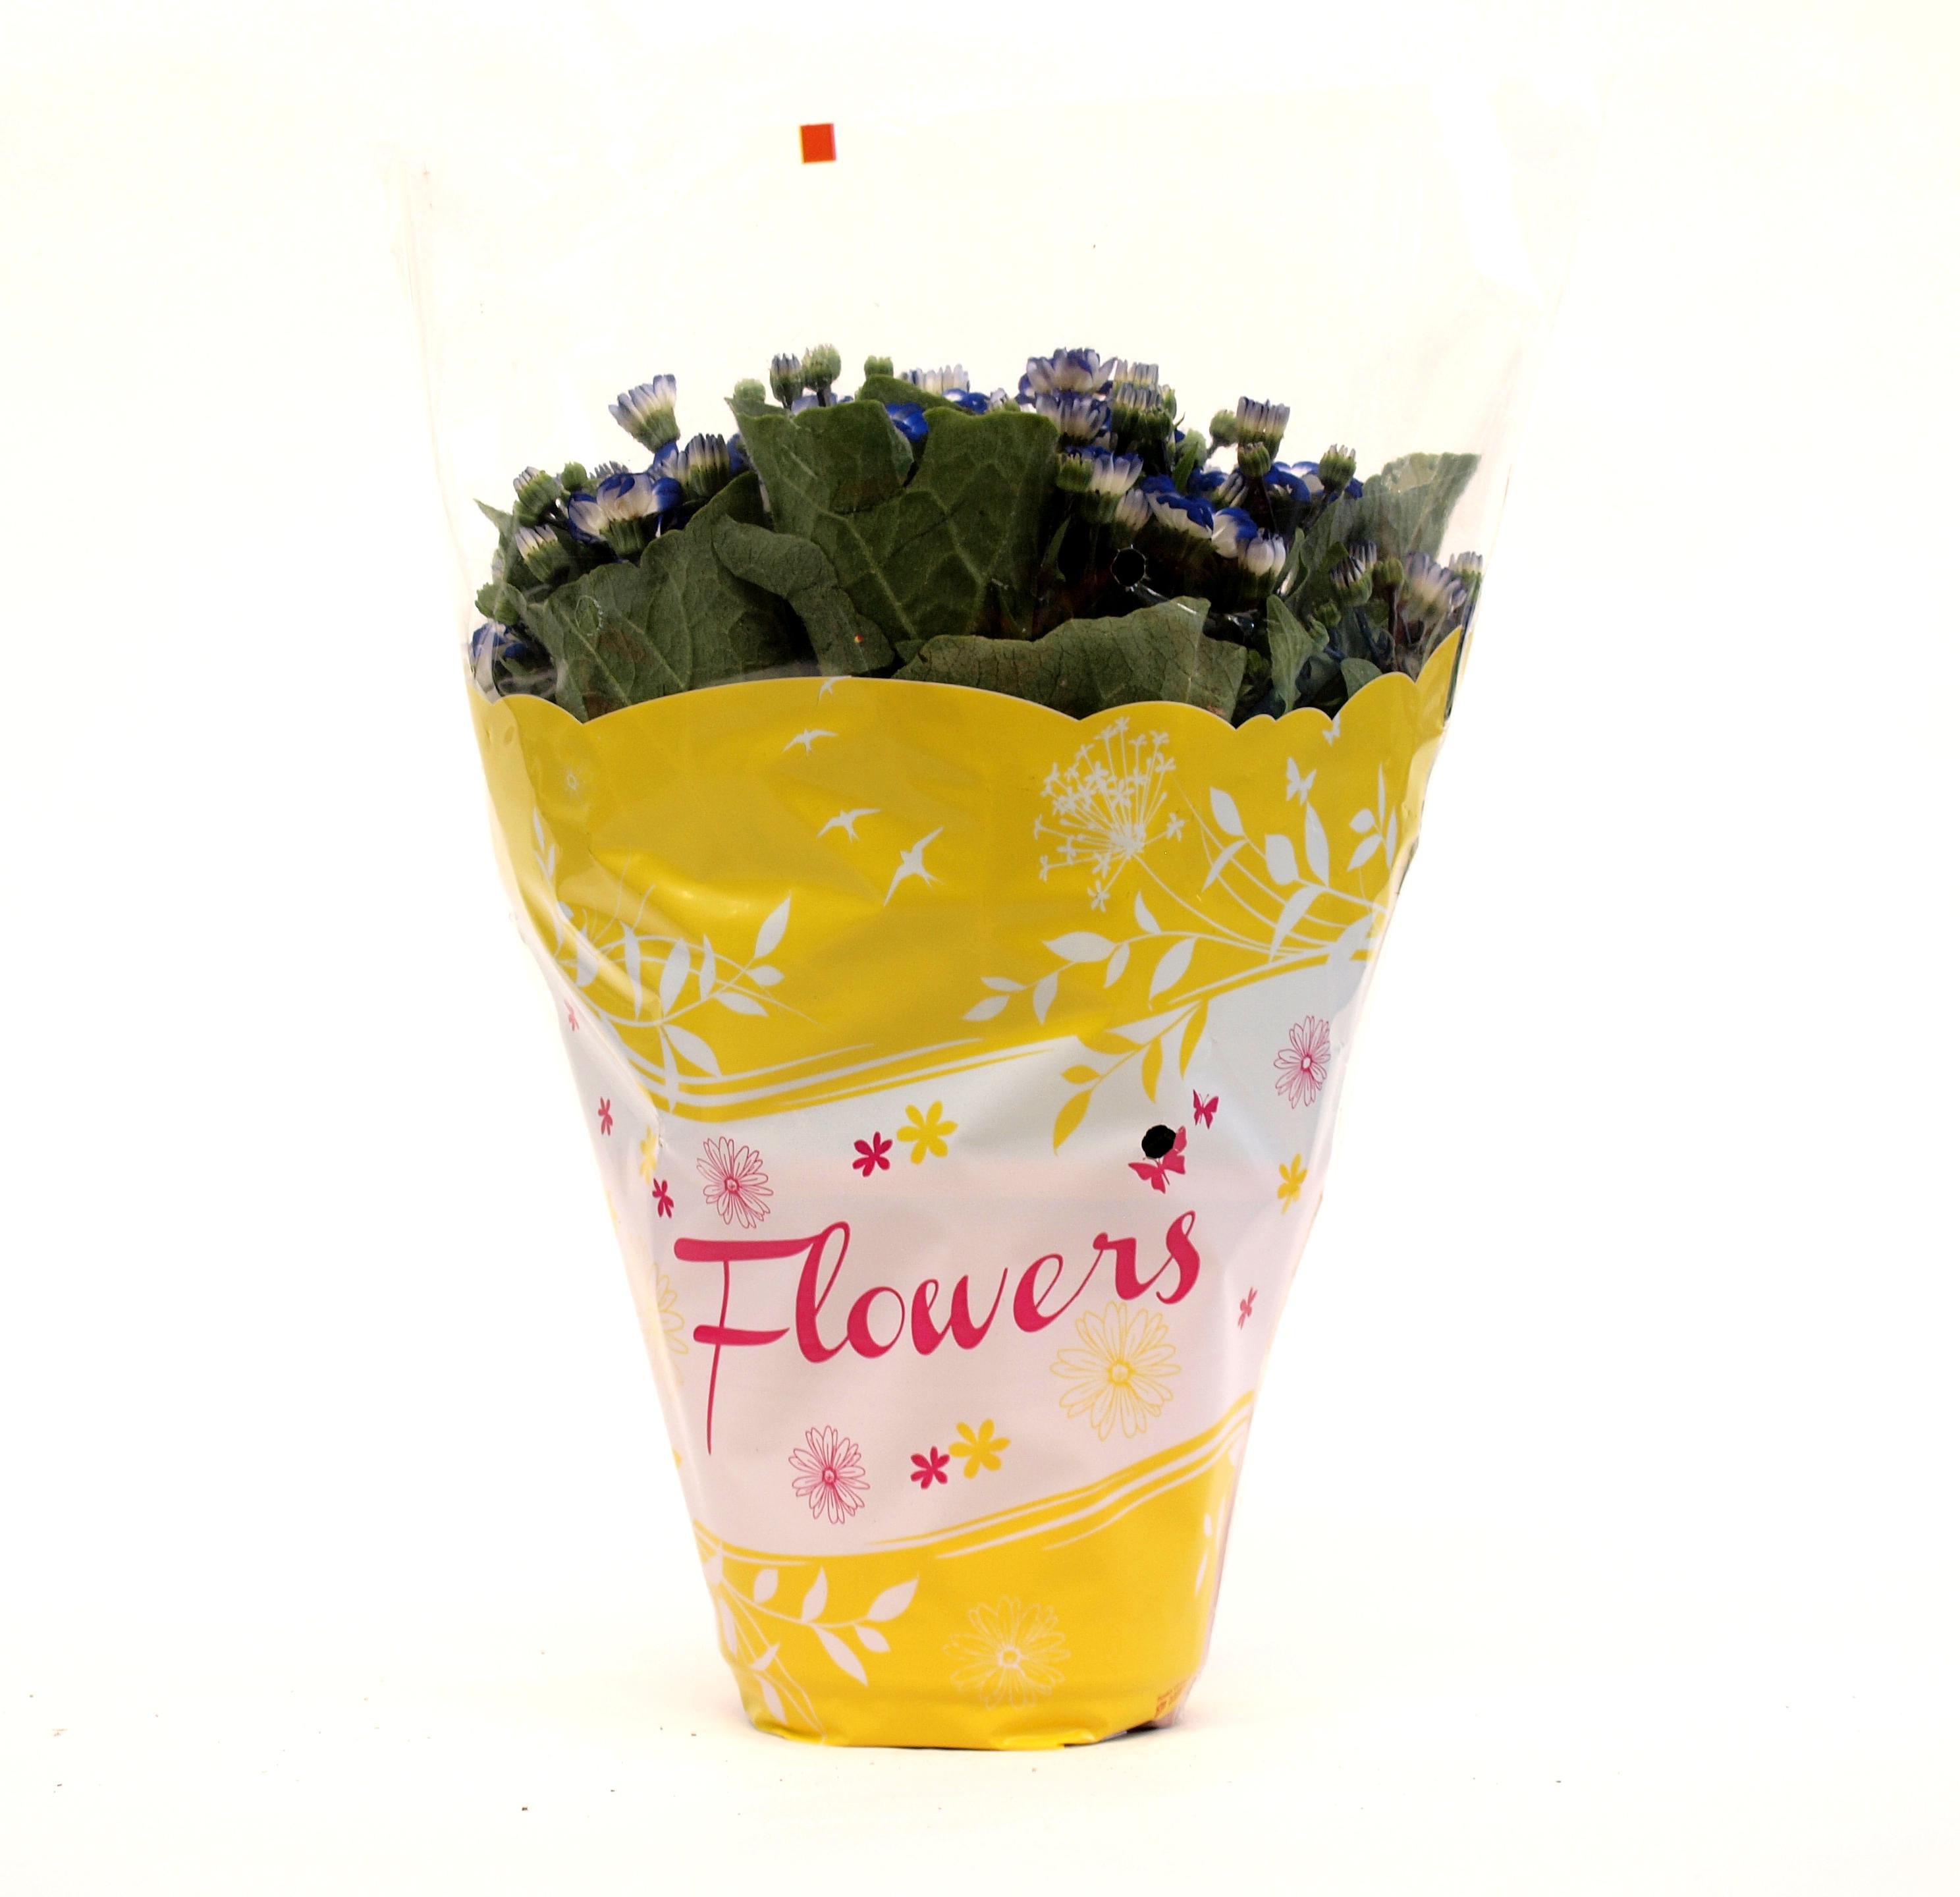 Flowers_giallo